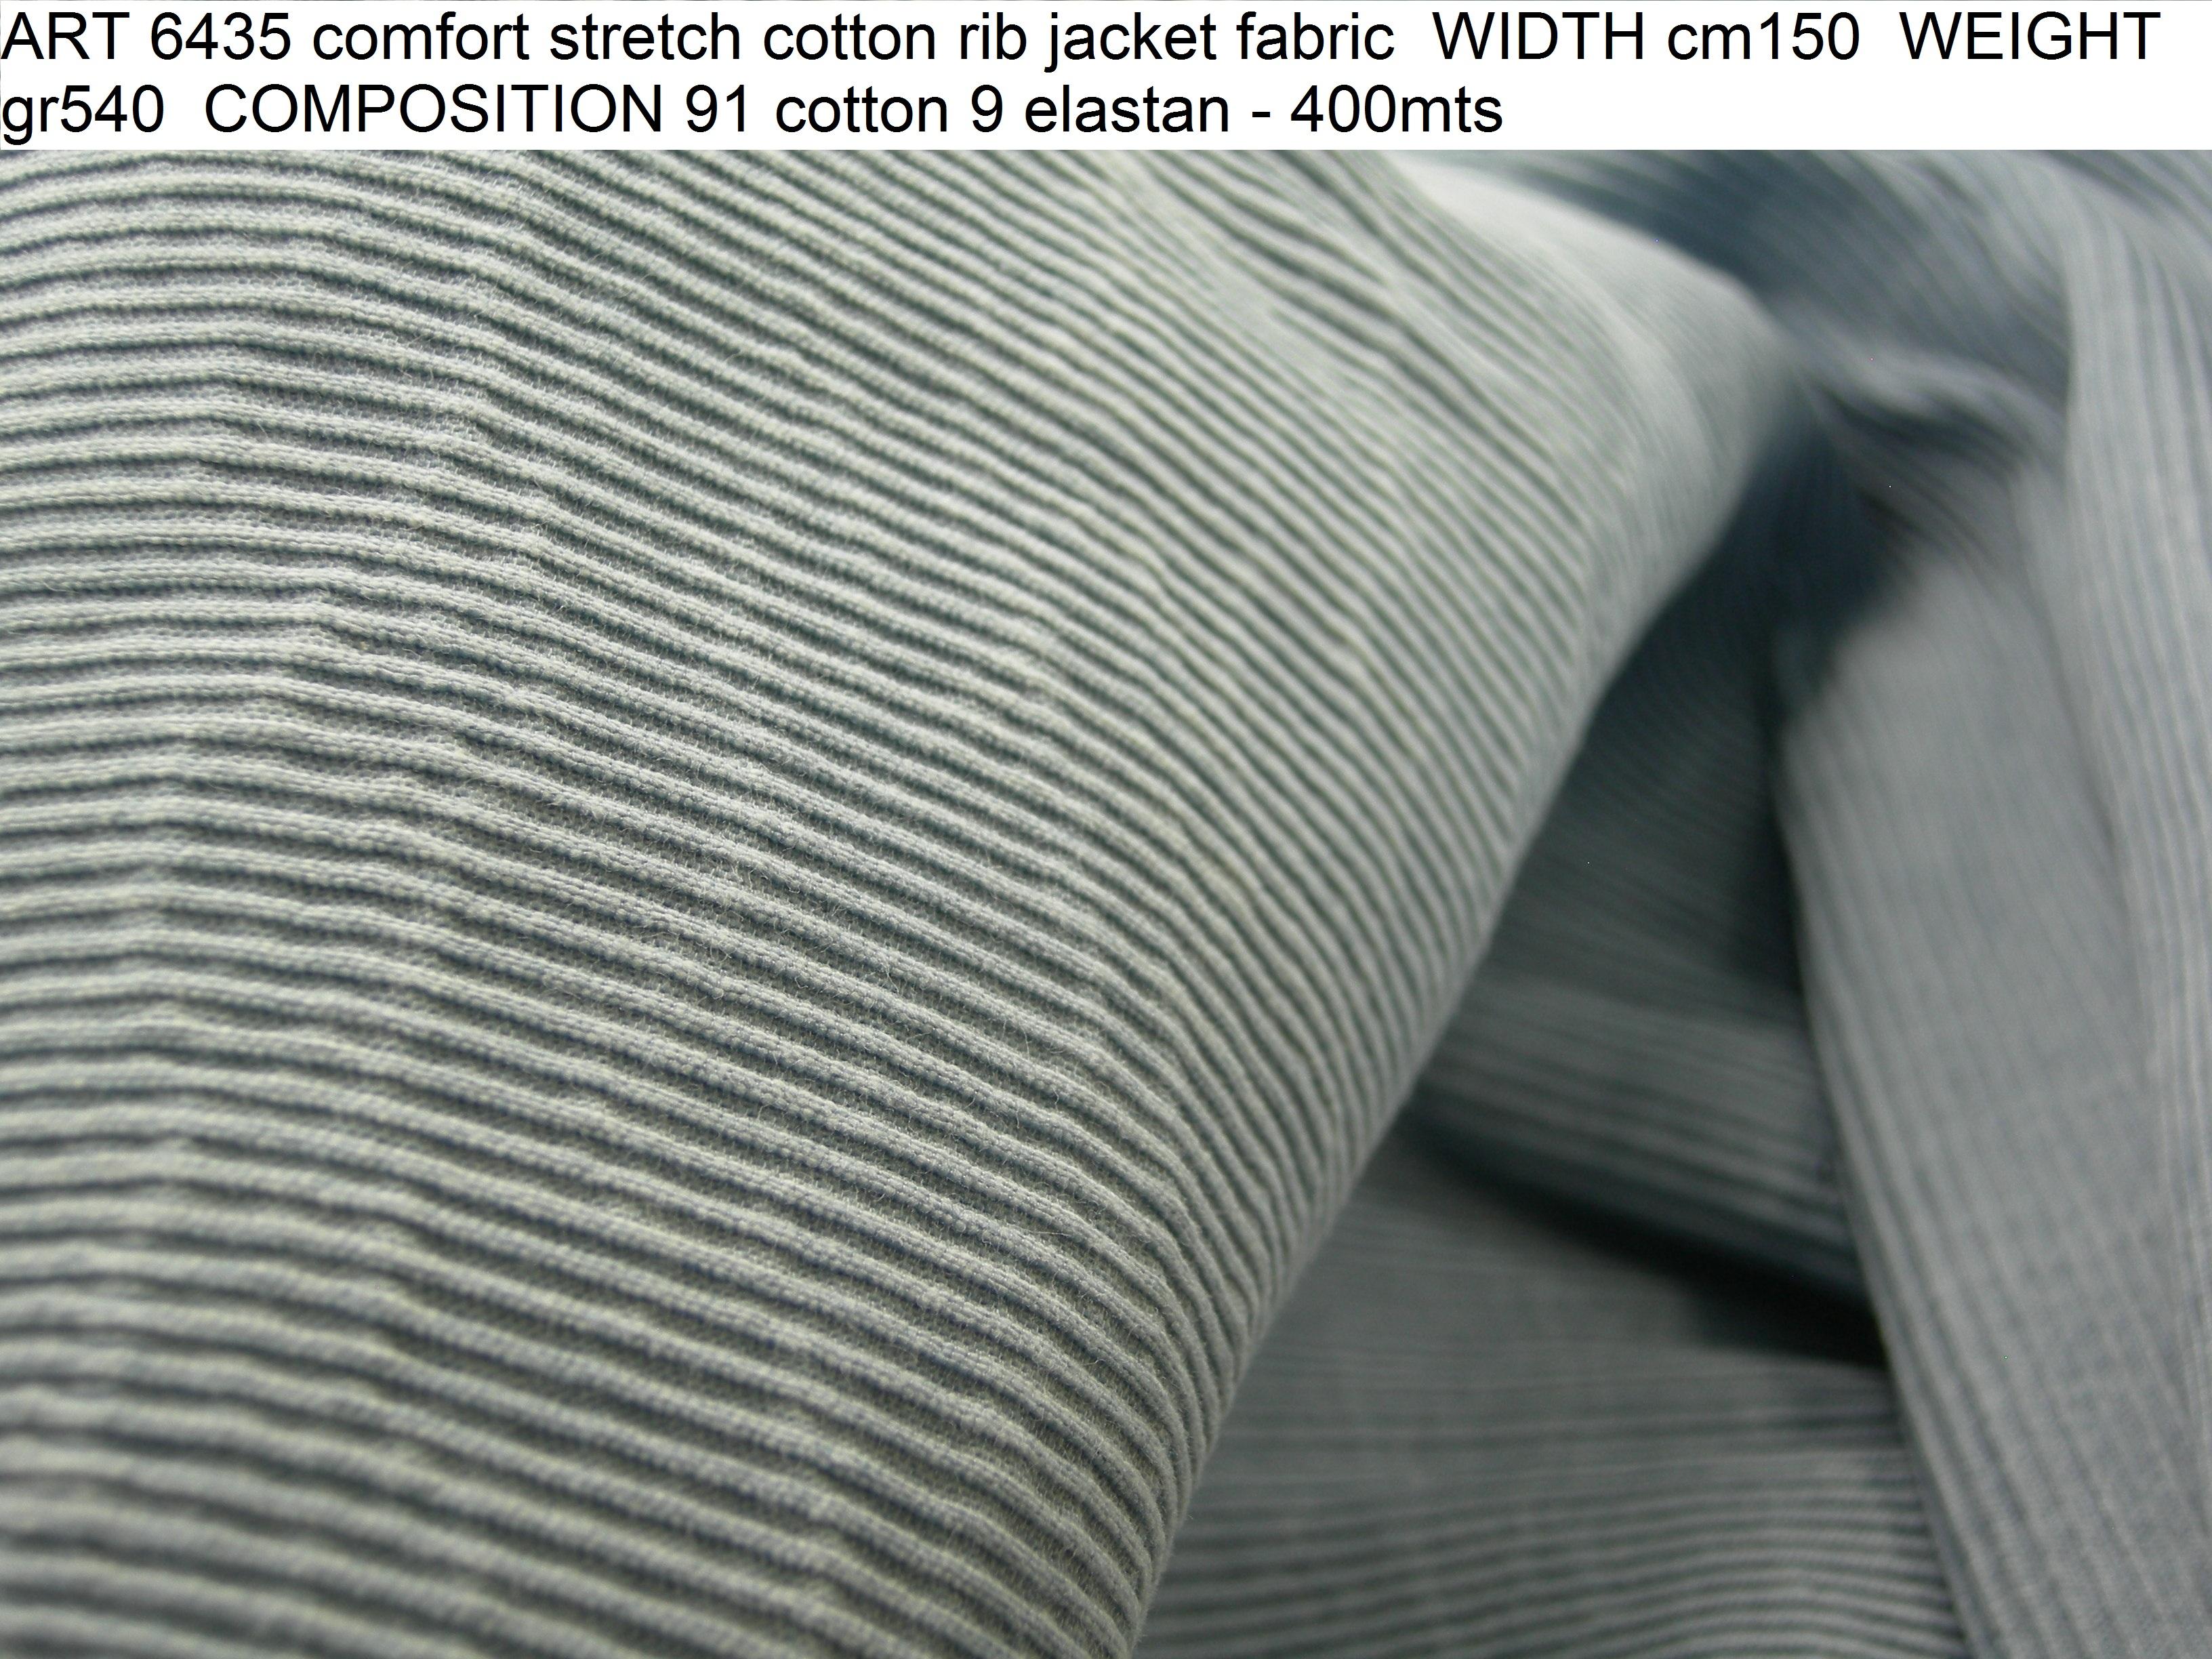 ART 6435 comfort stretch cotton rib jacket fabric WIDTH cm150 WEIGHT gr540 COMPOSITION 91 cotton 9 elastan - 400mts